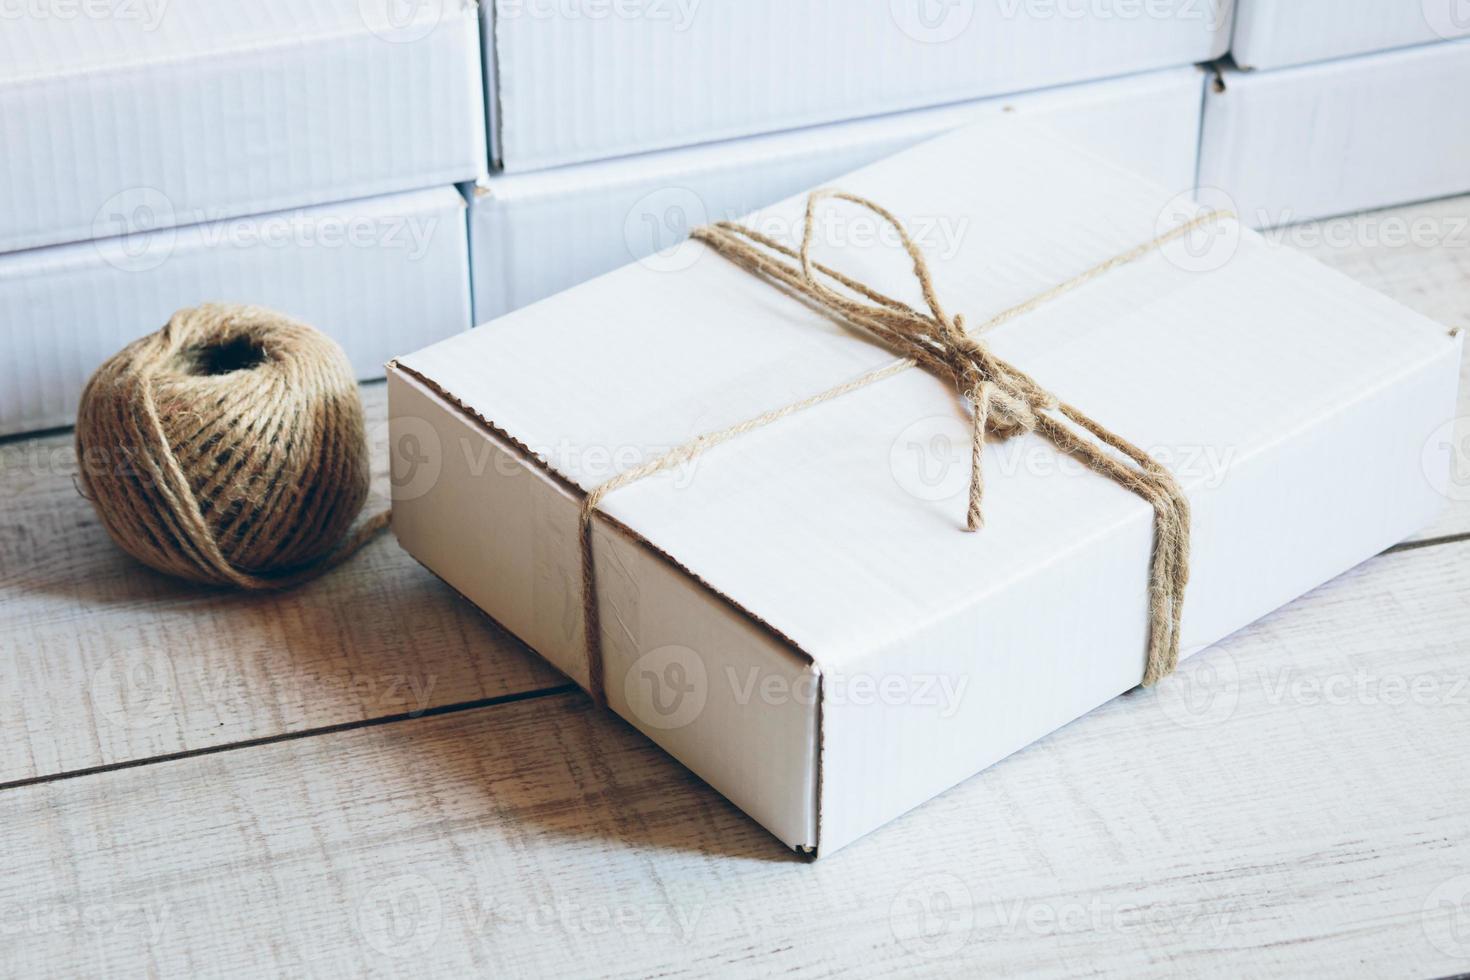 paketet på bordet foto